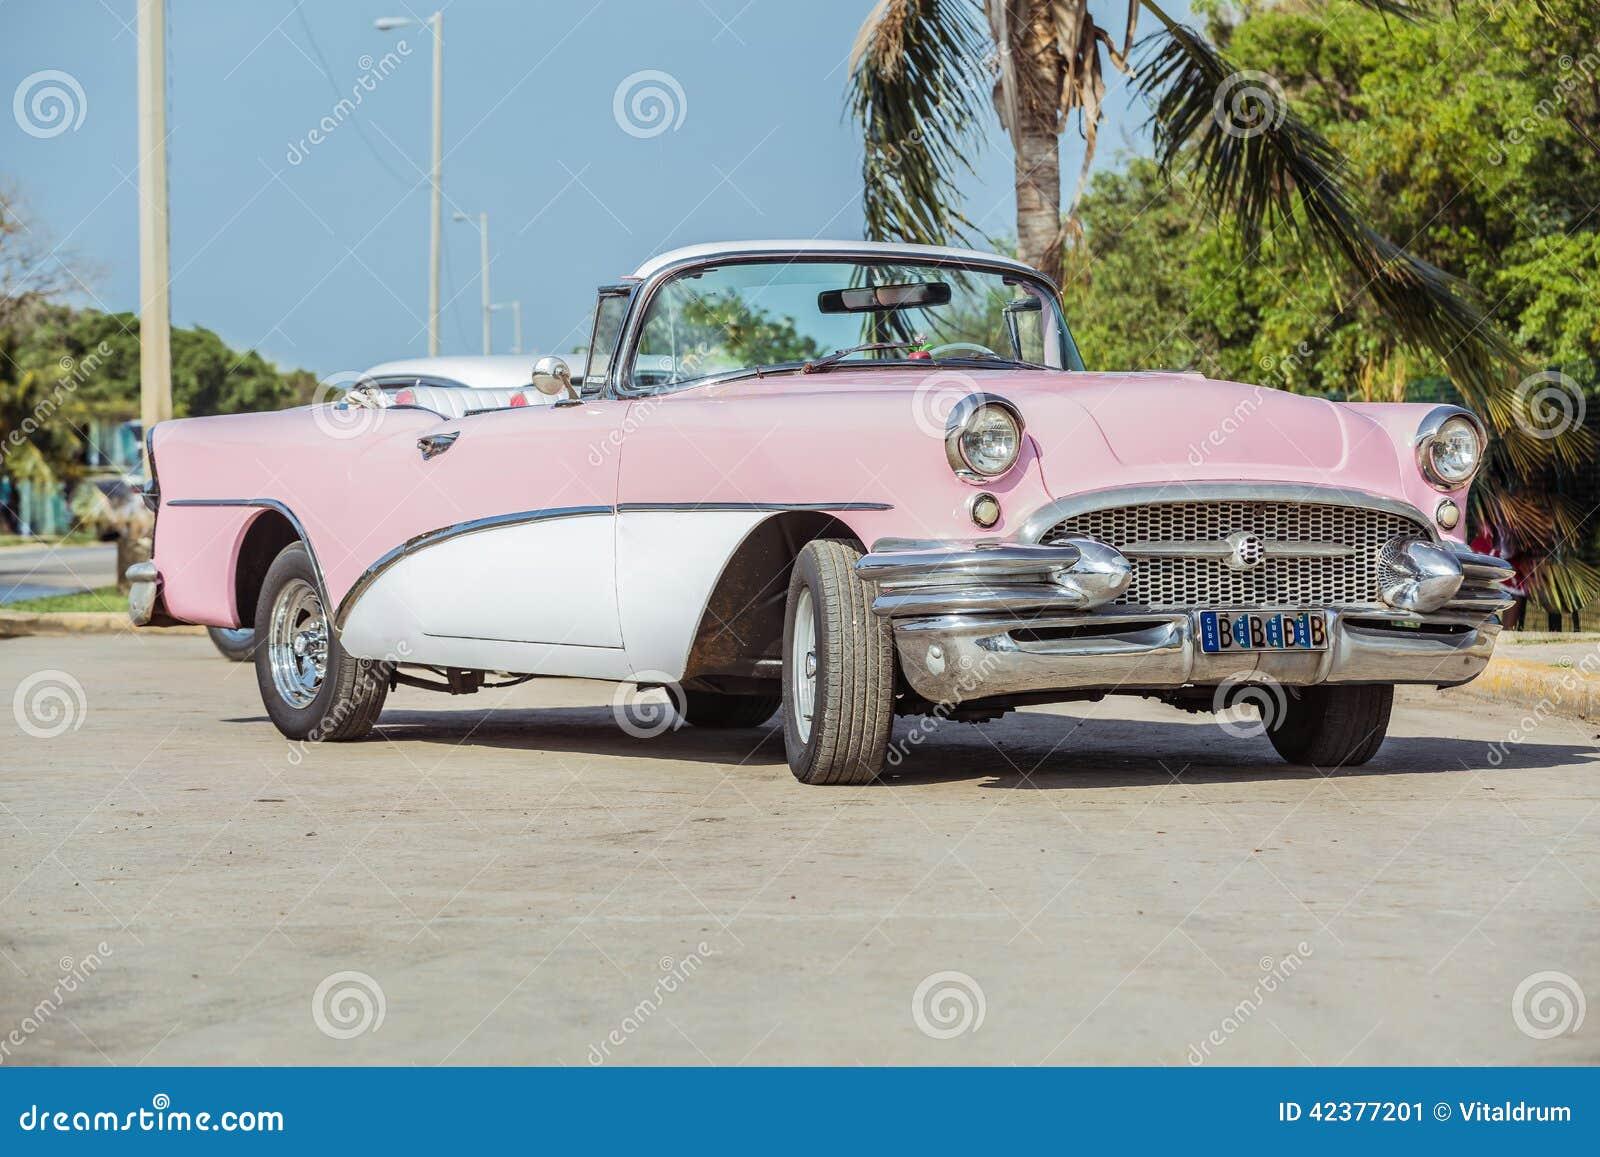 Texoma Vintage/Classic Car Club - Home